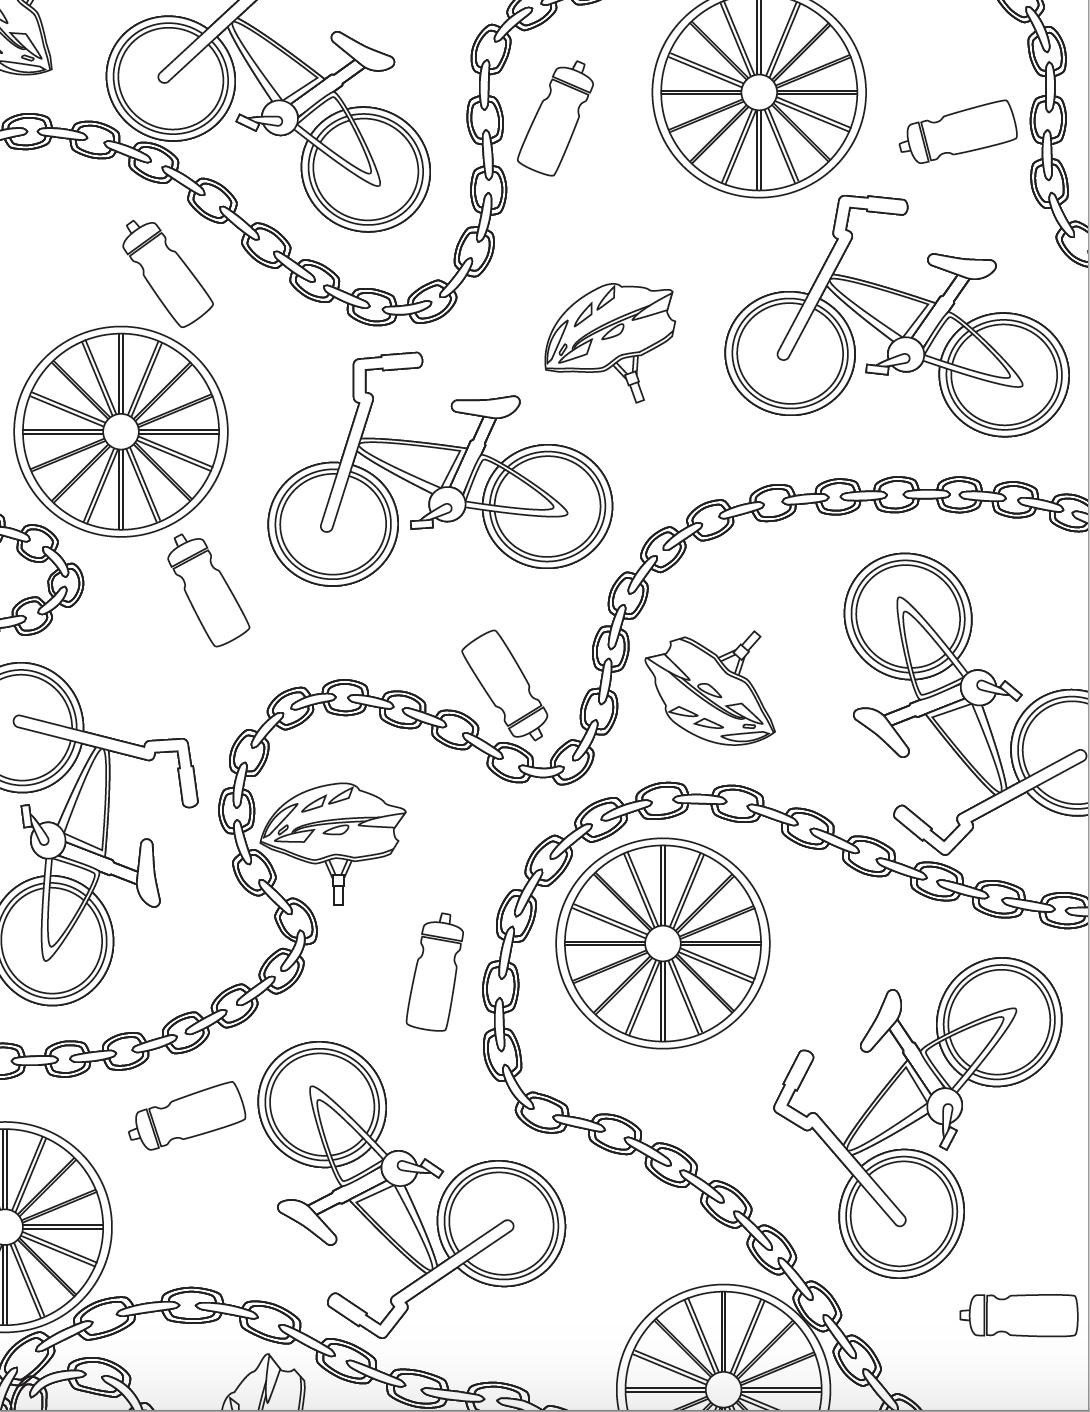 MSU Bike Adult Coloring Page